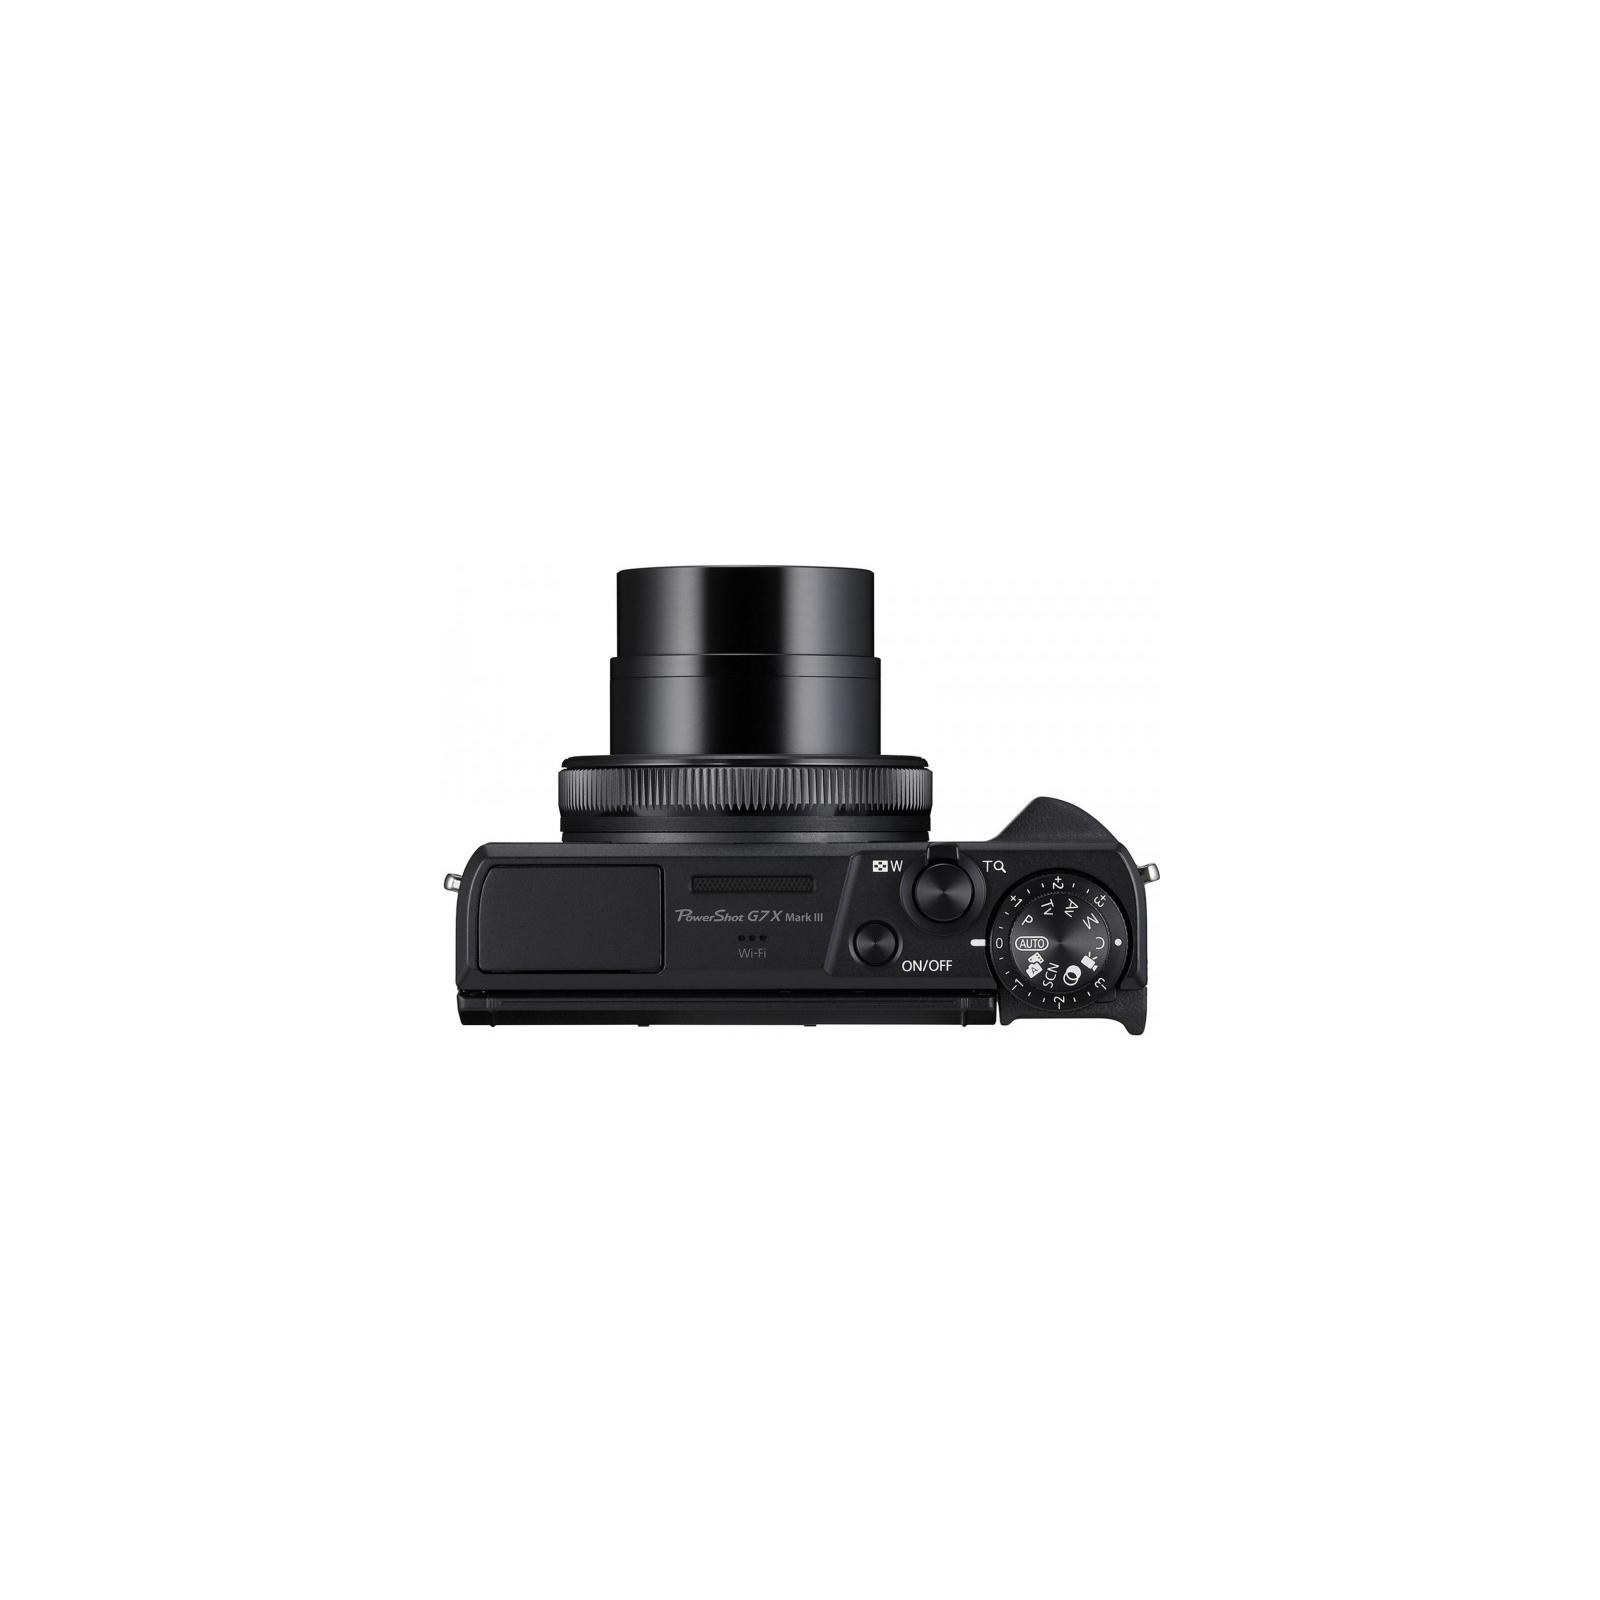 Цифровой фотоаппарат Canon Powershot G7 X Mark III Black (3637C013) изображение 8